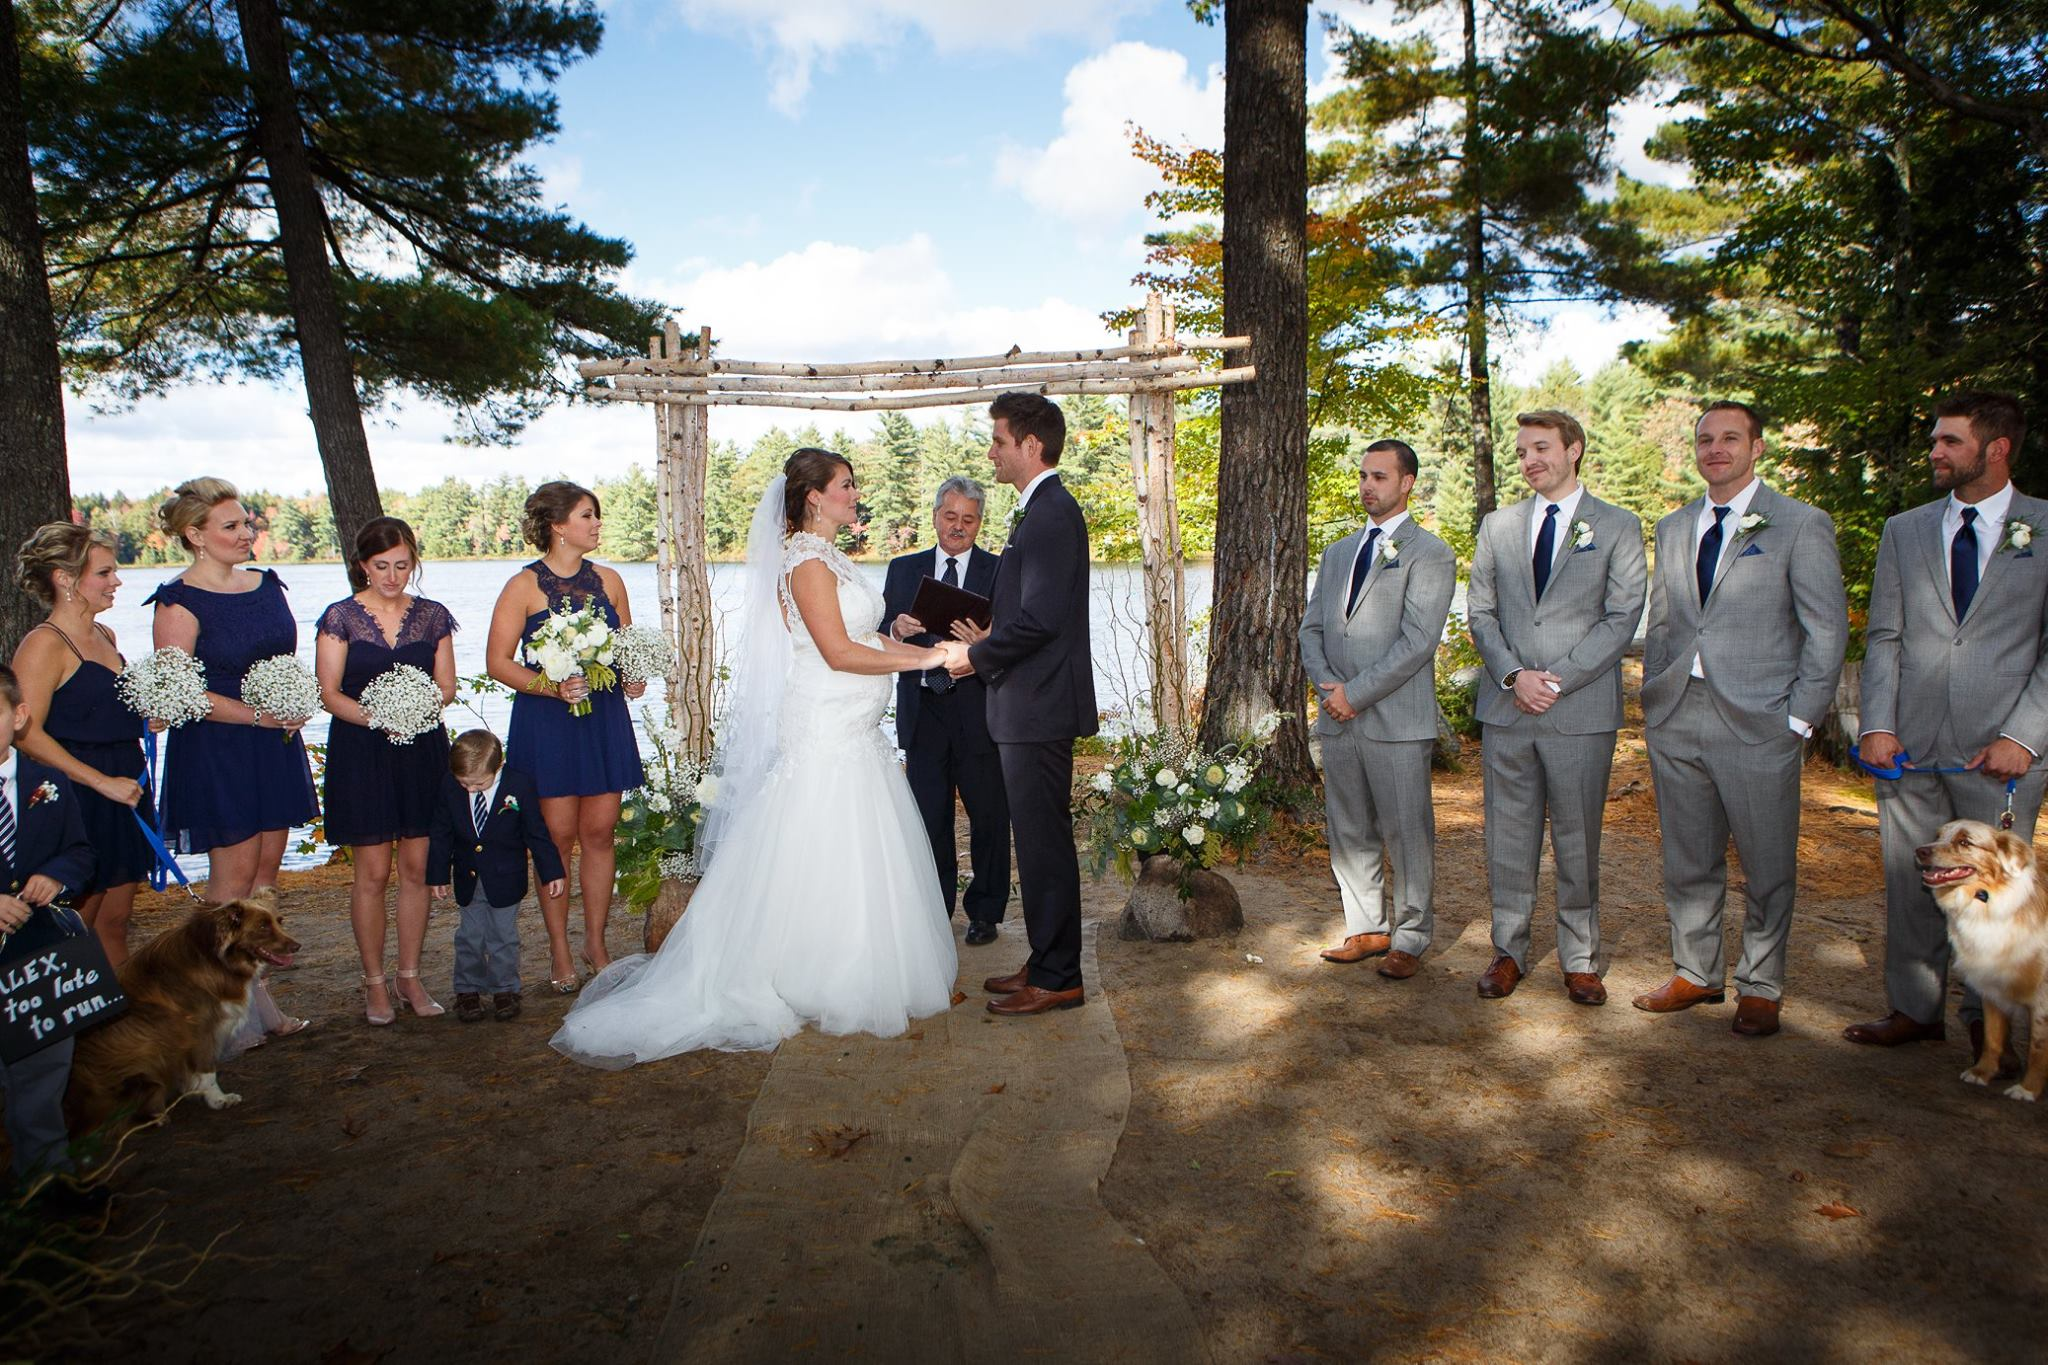 Planning A Wedding In Muskoka Ottawa Wedding Amp Events Blog